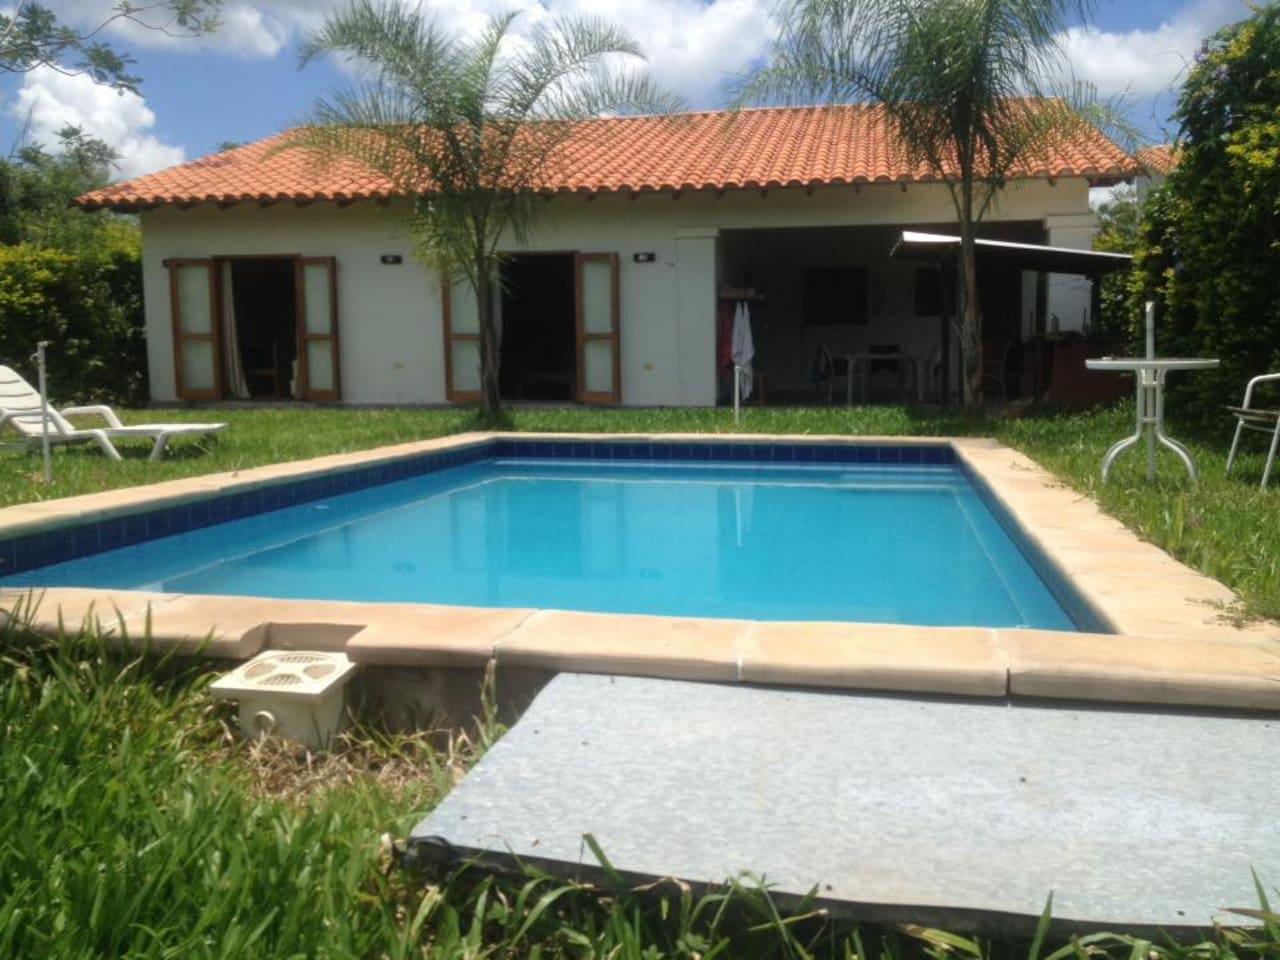 Pool garden barbeque